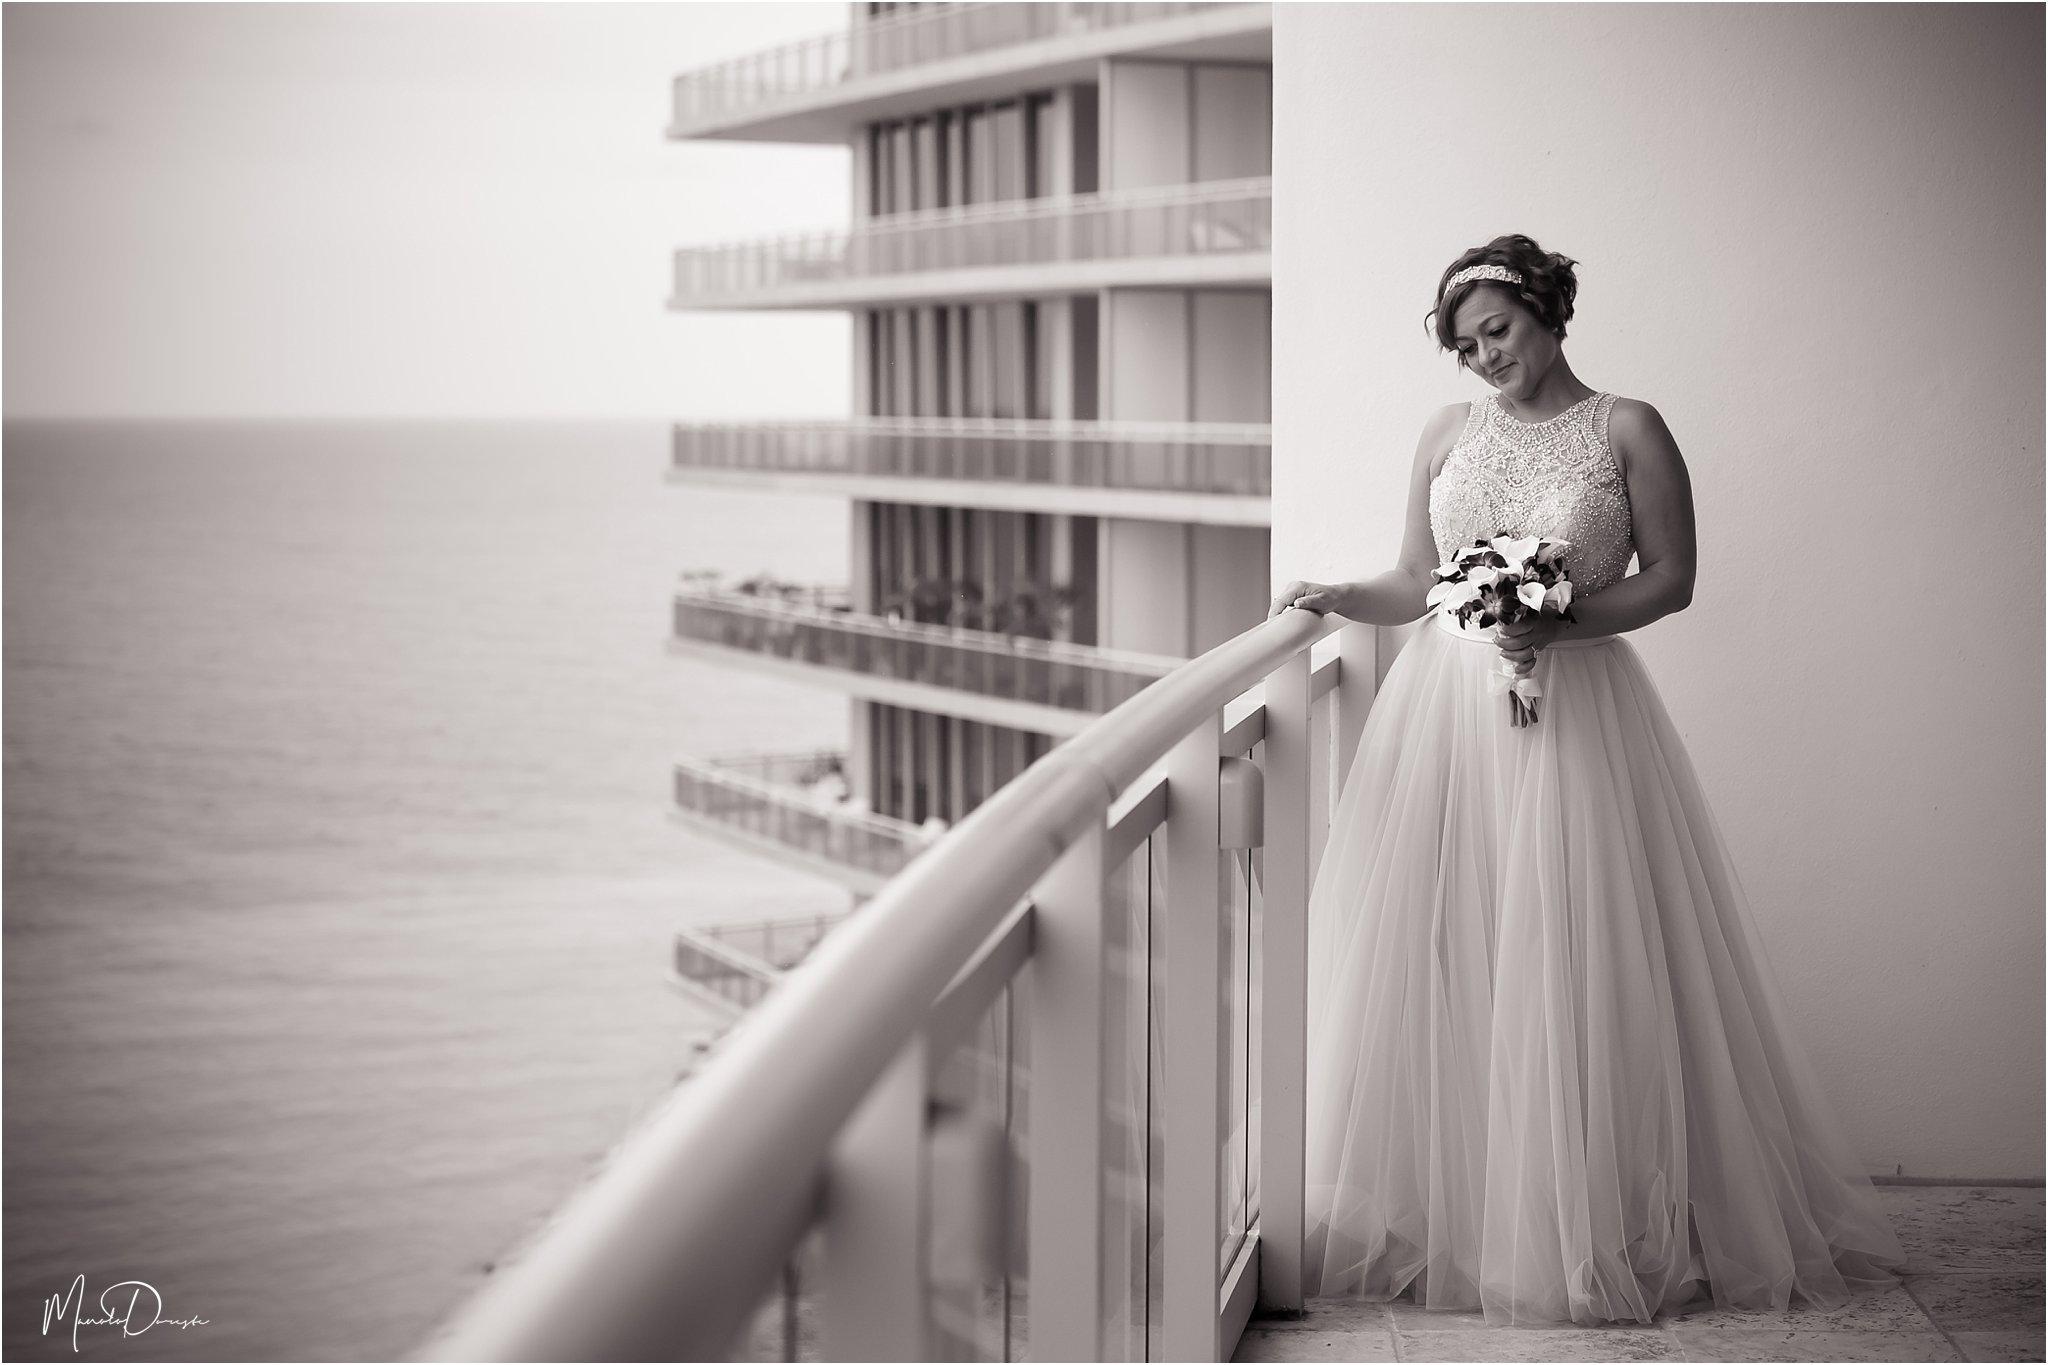 0441_ManoloDoreste_InFocusStudios_Wedding_Family_Photography_Miami_MiamiPhotographer.jpg